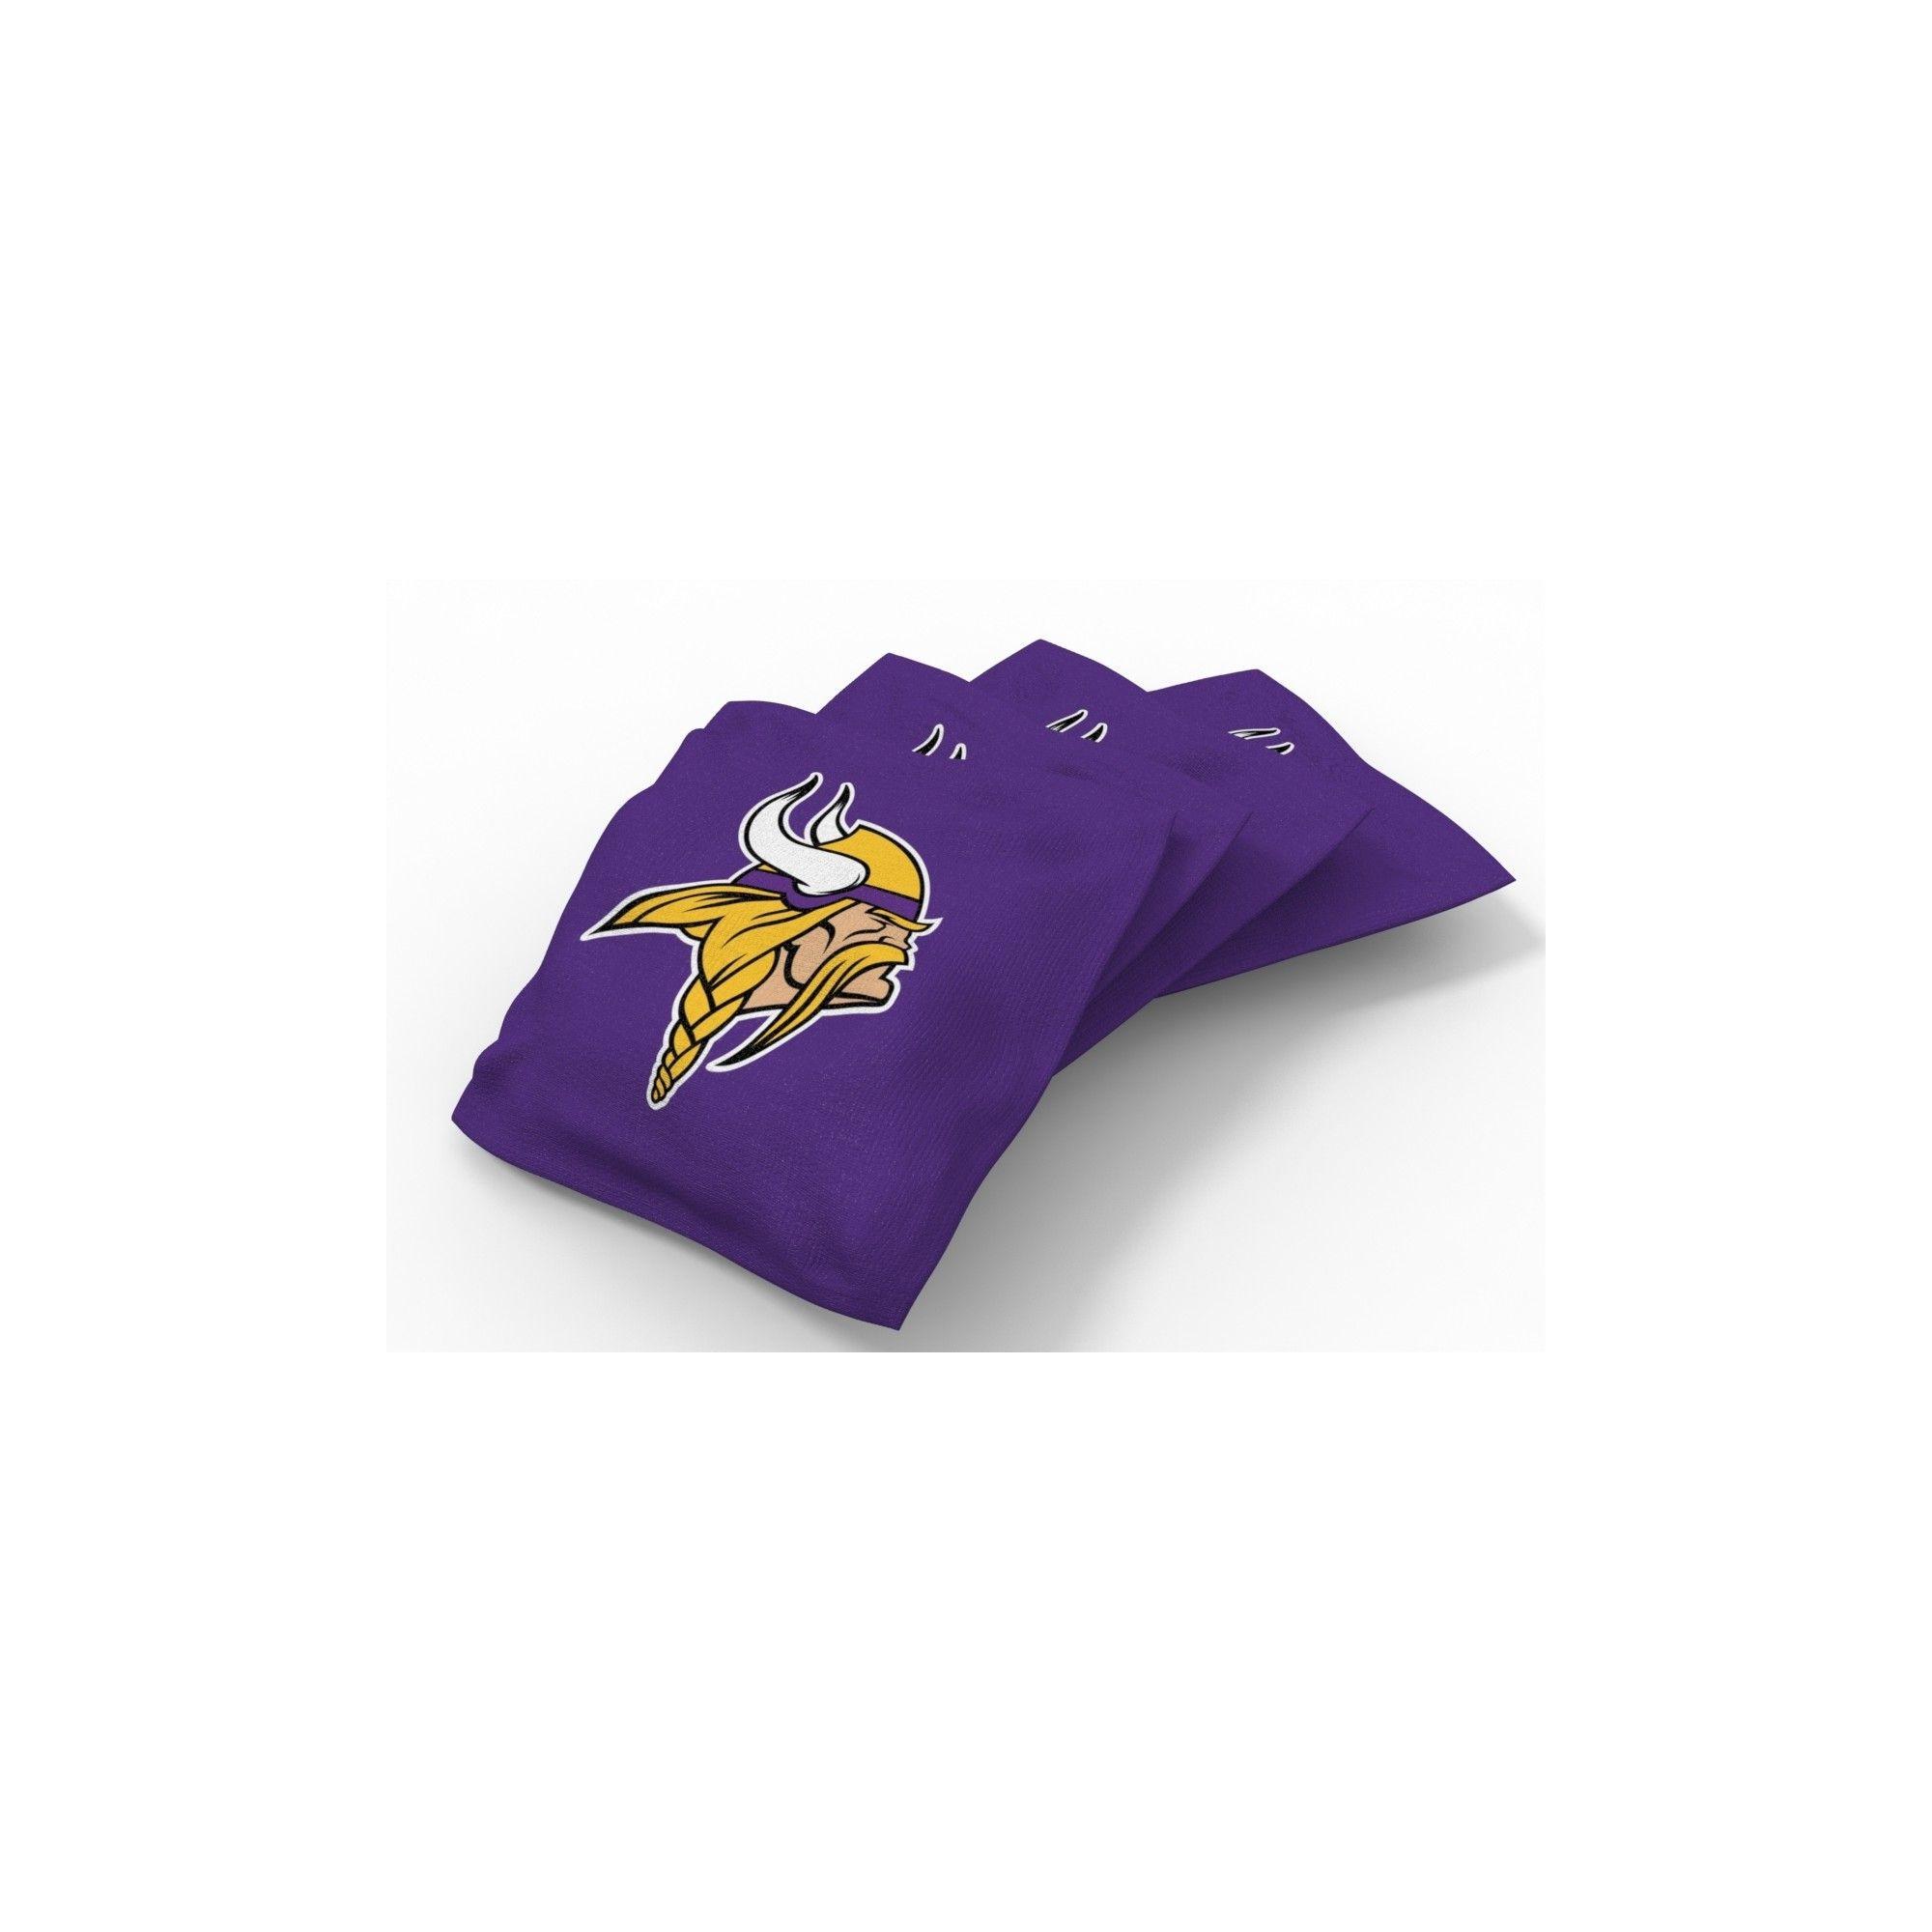 Sensational Nfl Minnesota Vikings Wild Sports Regulation Cornhole Bean Dailytribune Chair Design For Home Dailytribuneorg